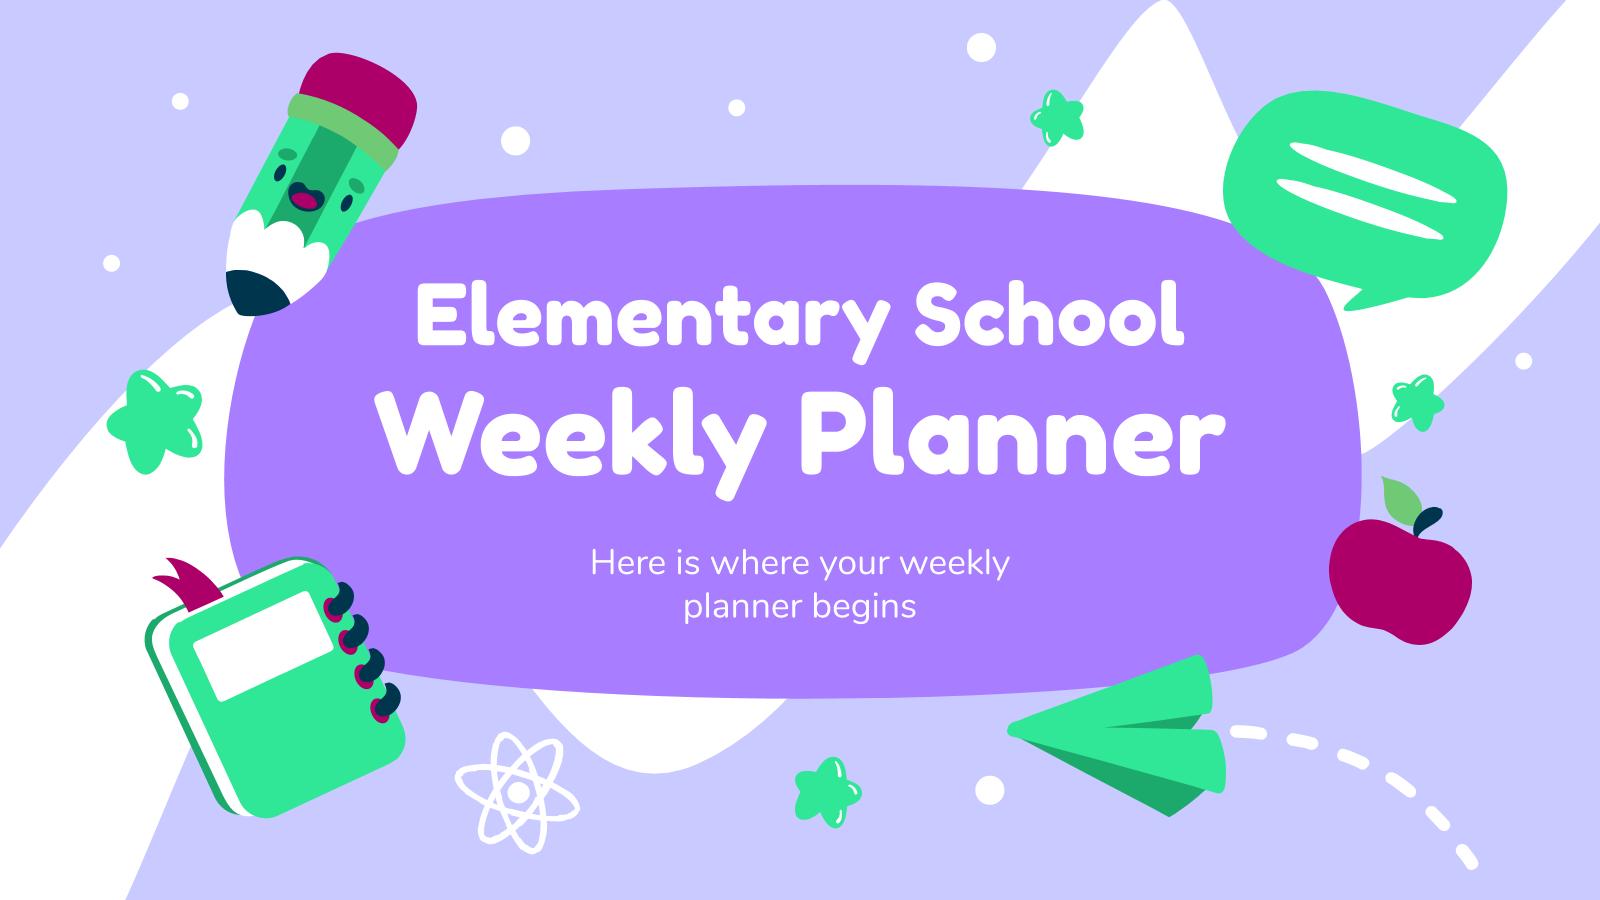 Plantilla de presentación Agenda semanal escolar